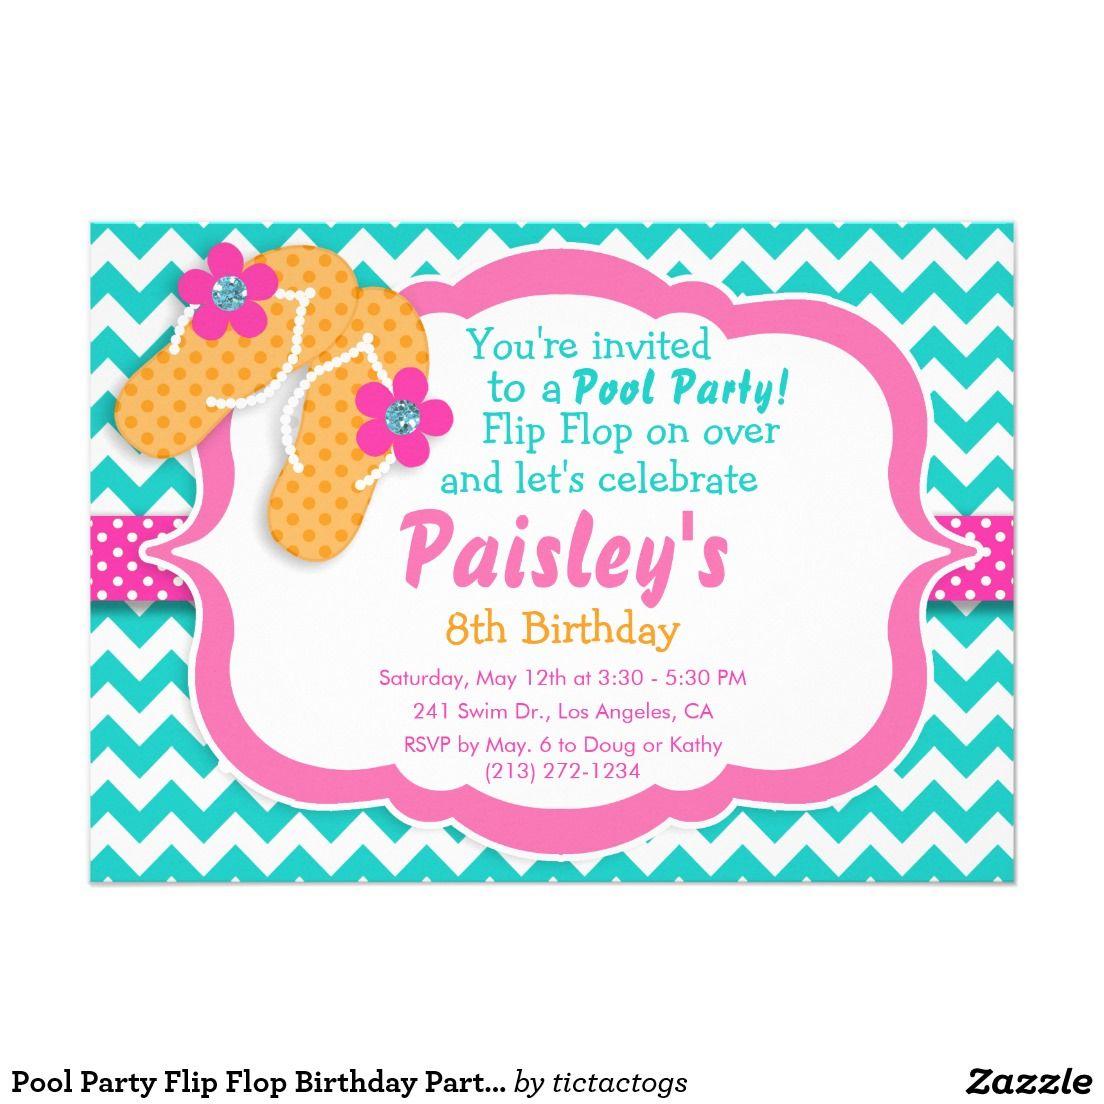 Pool Party Flip Flop Birthday Party Invitation | Kids 2-12 Birthday ...